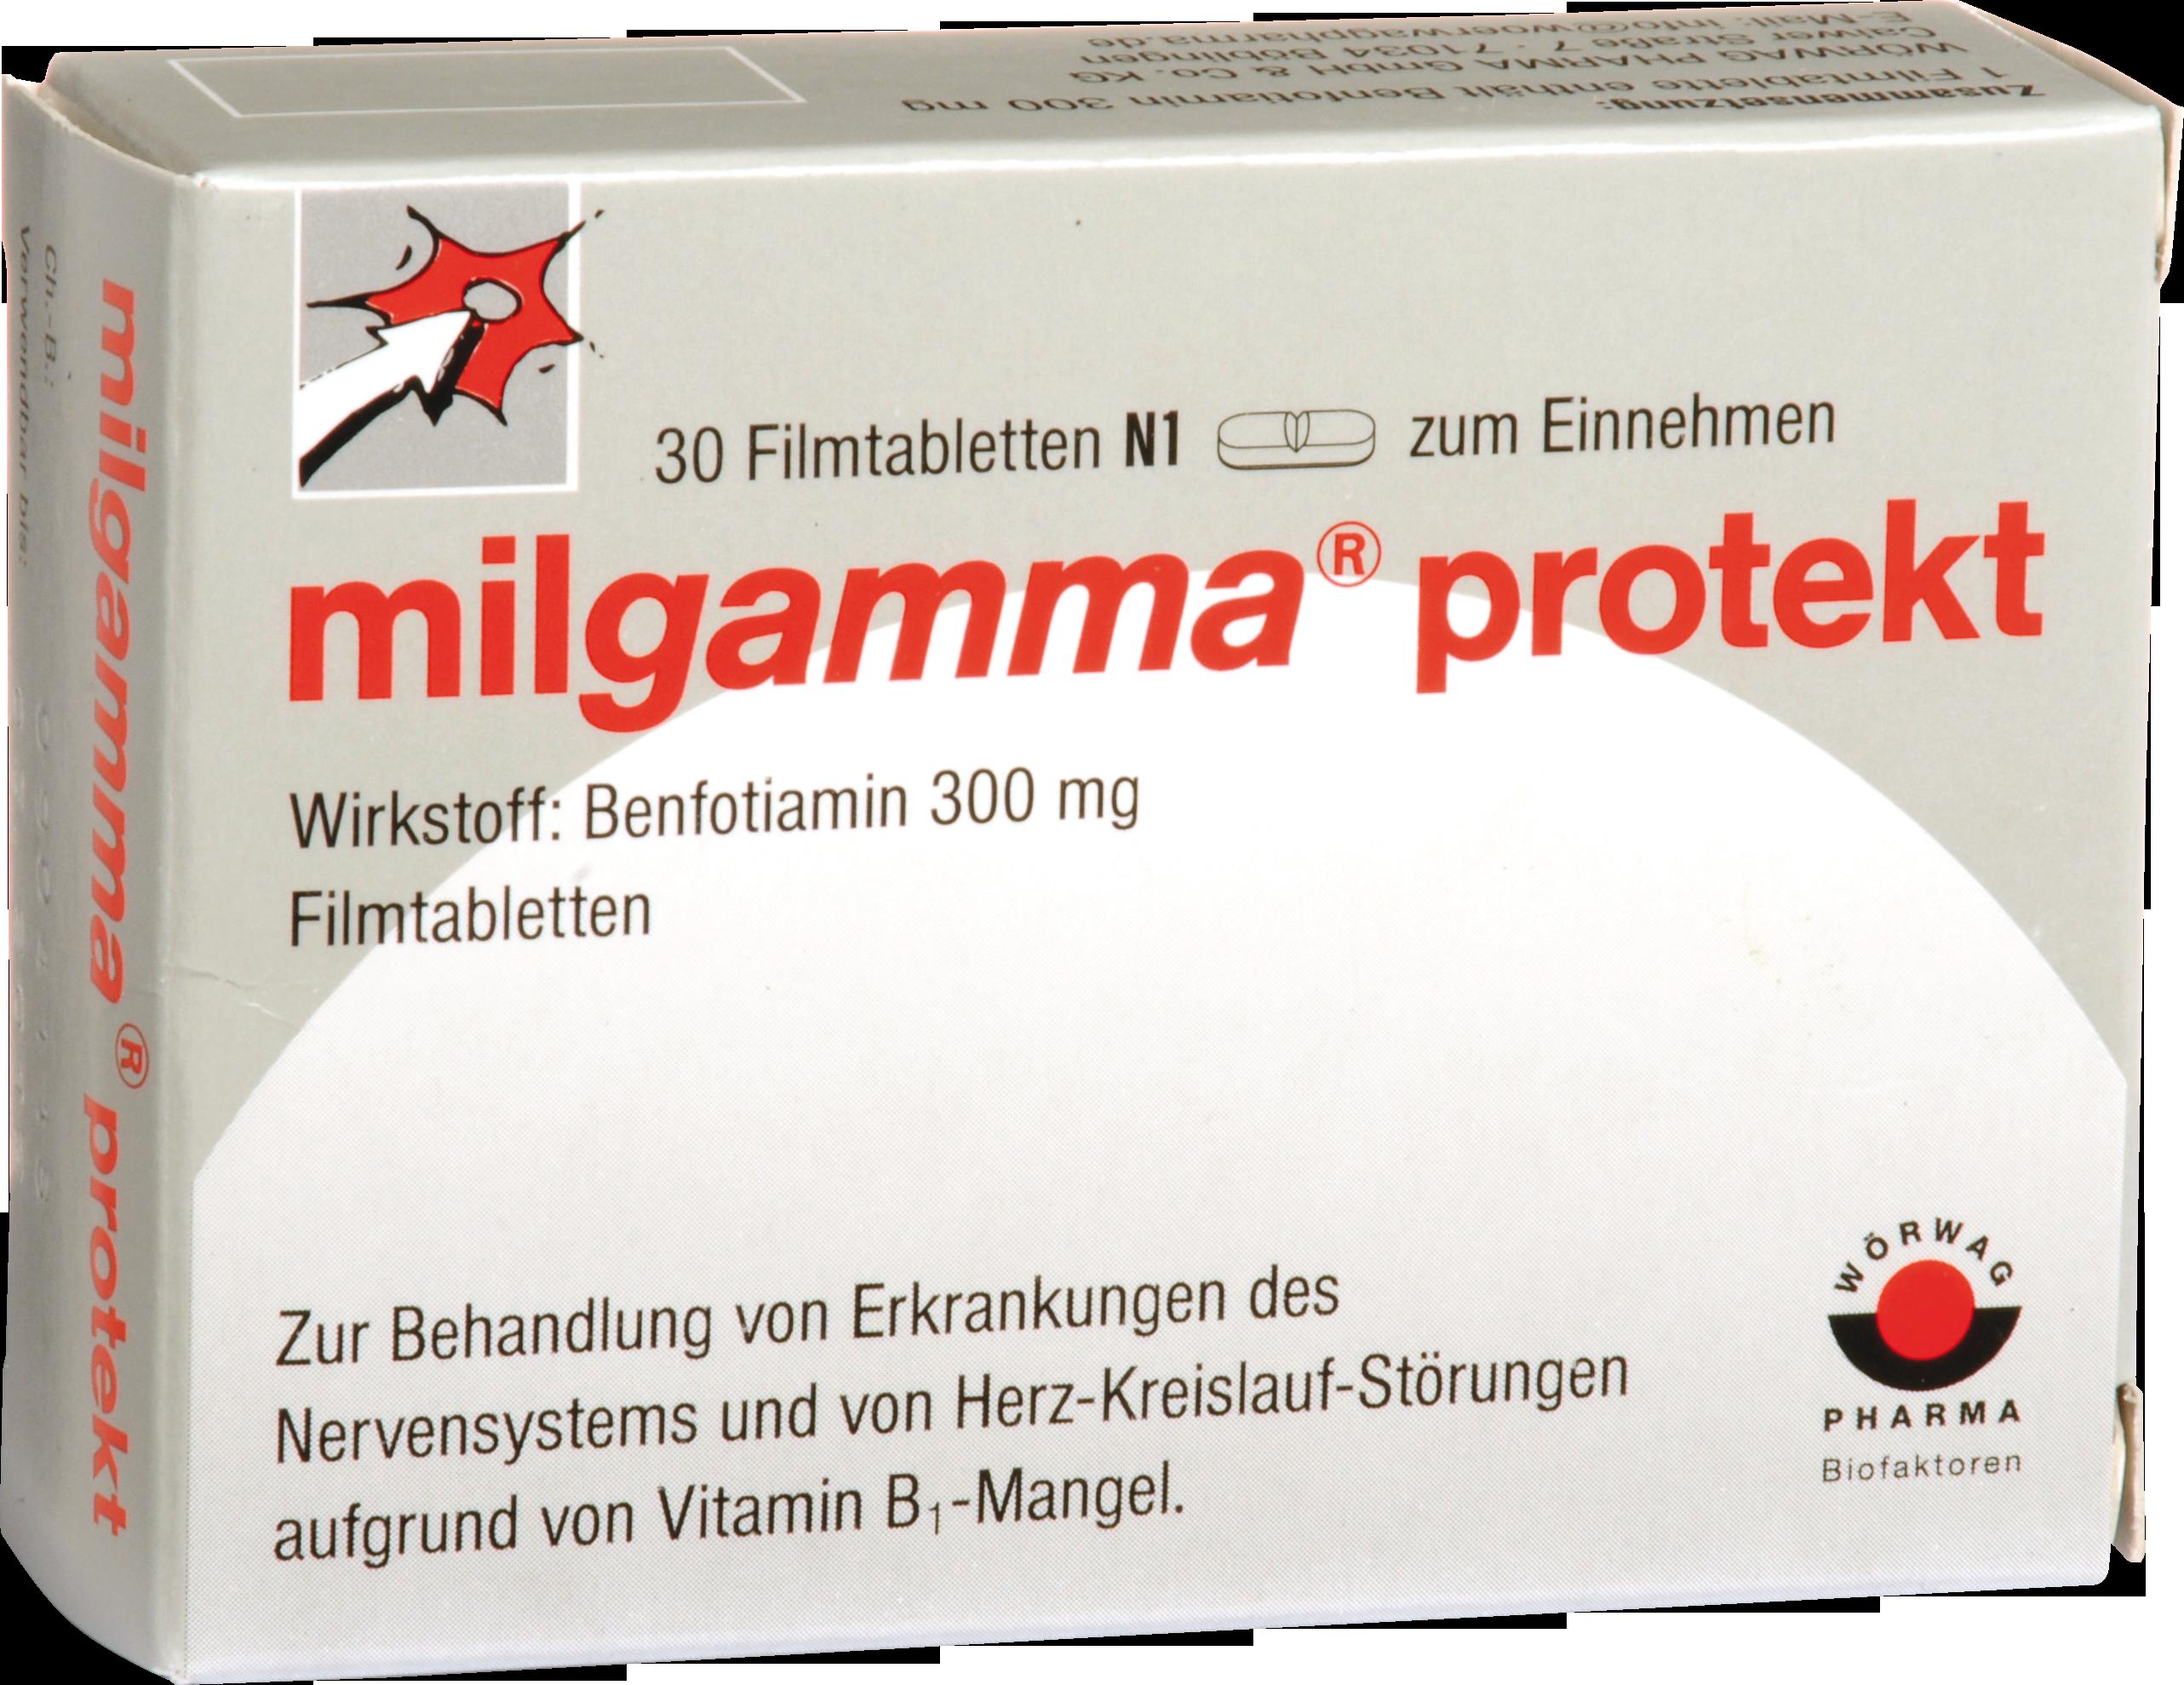 milgamma protekt